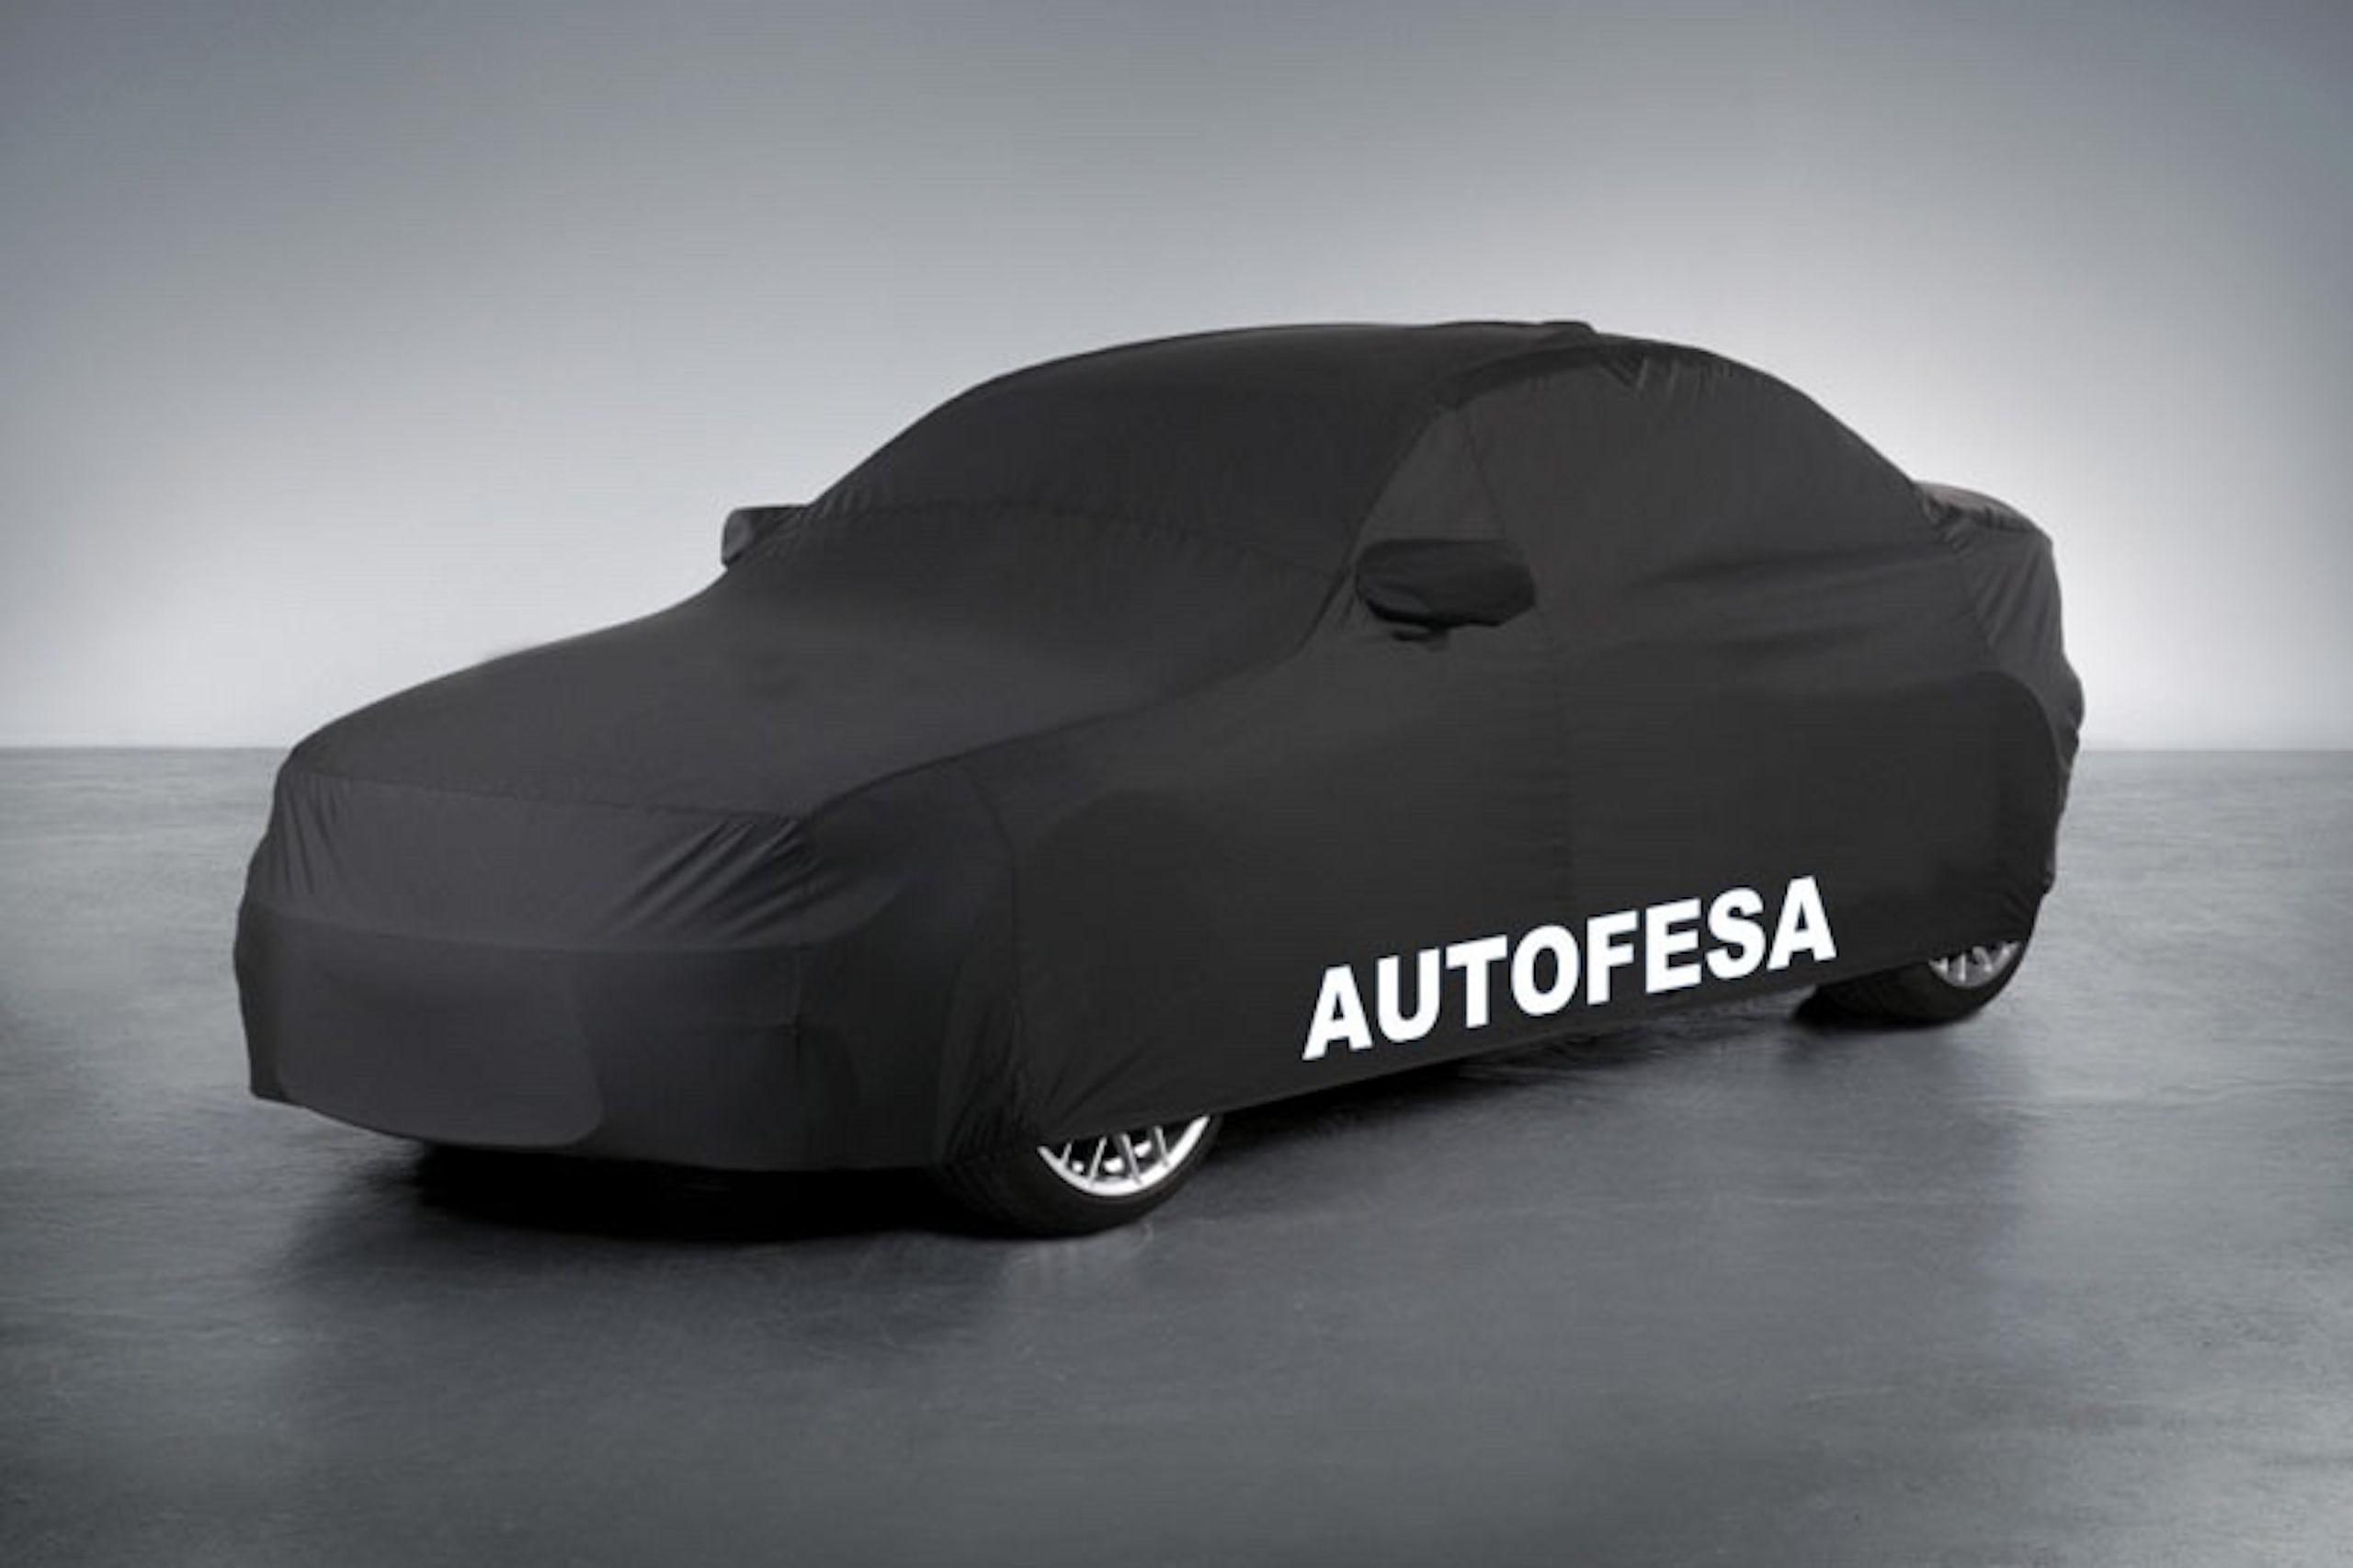 Lexus Nx 300h 300h 2.5 197cv Luxury 4WD 5p CVT Auto - Foto 27